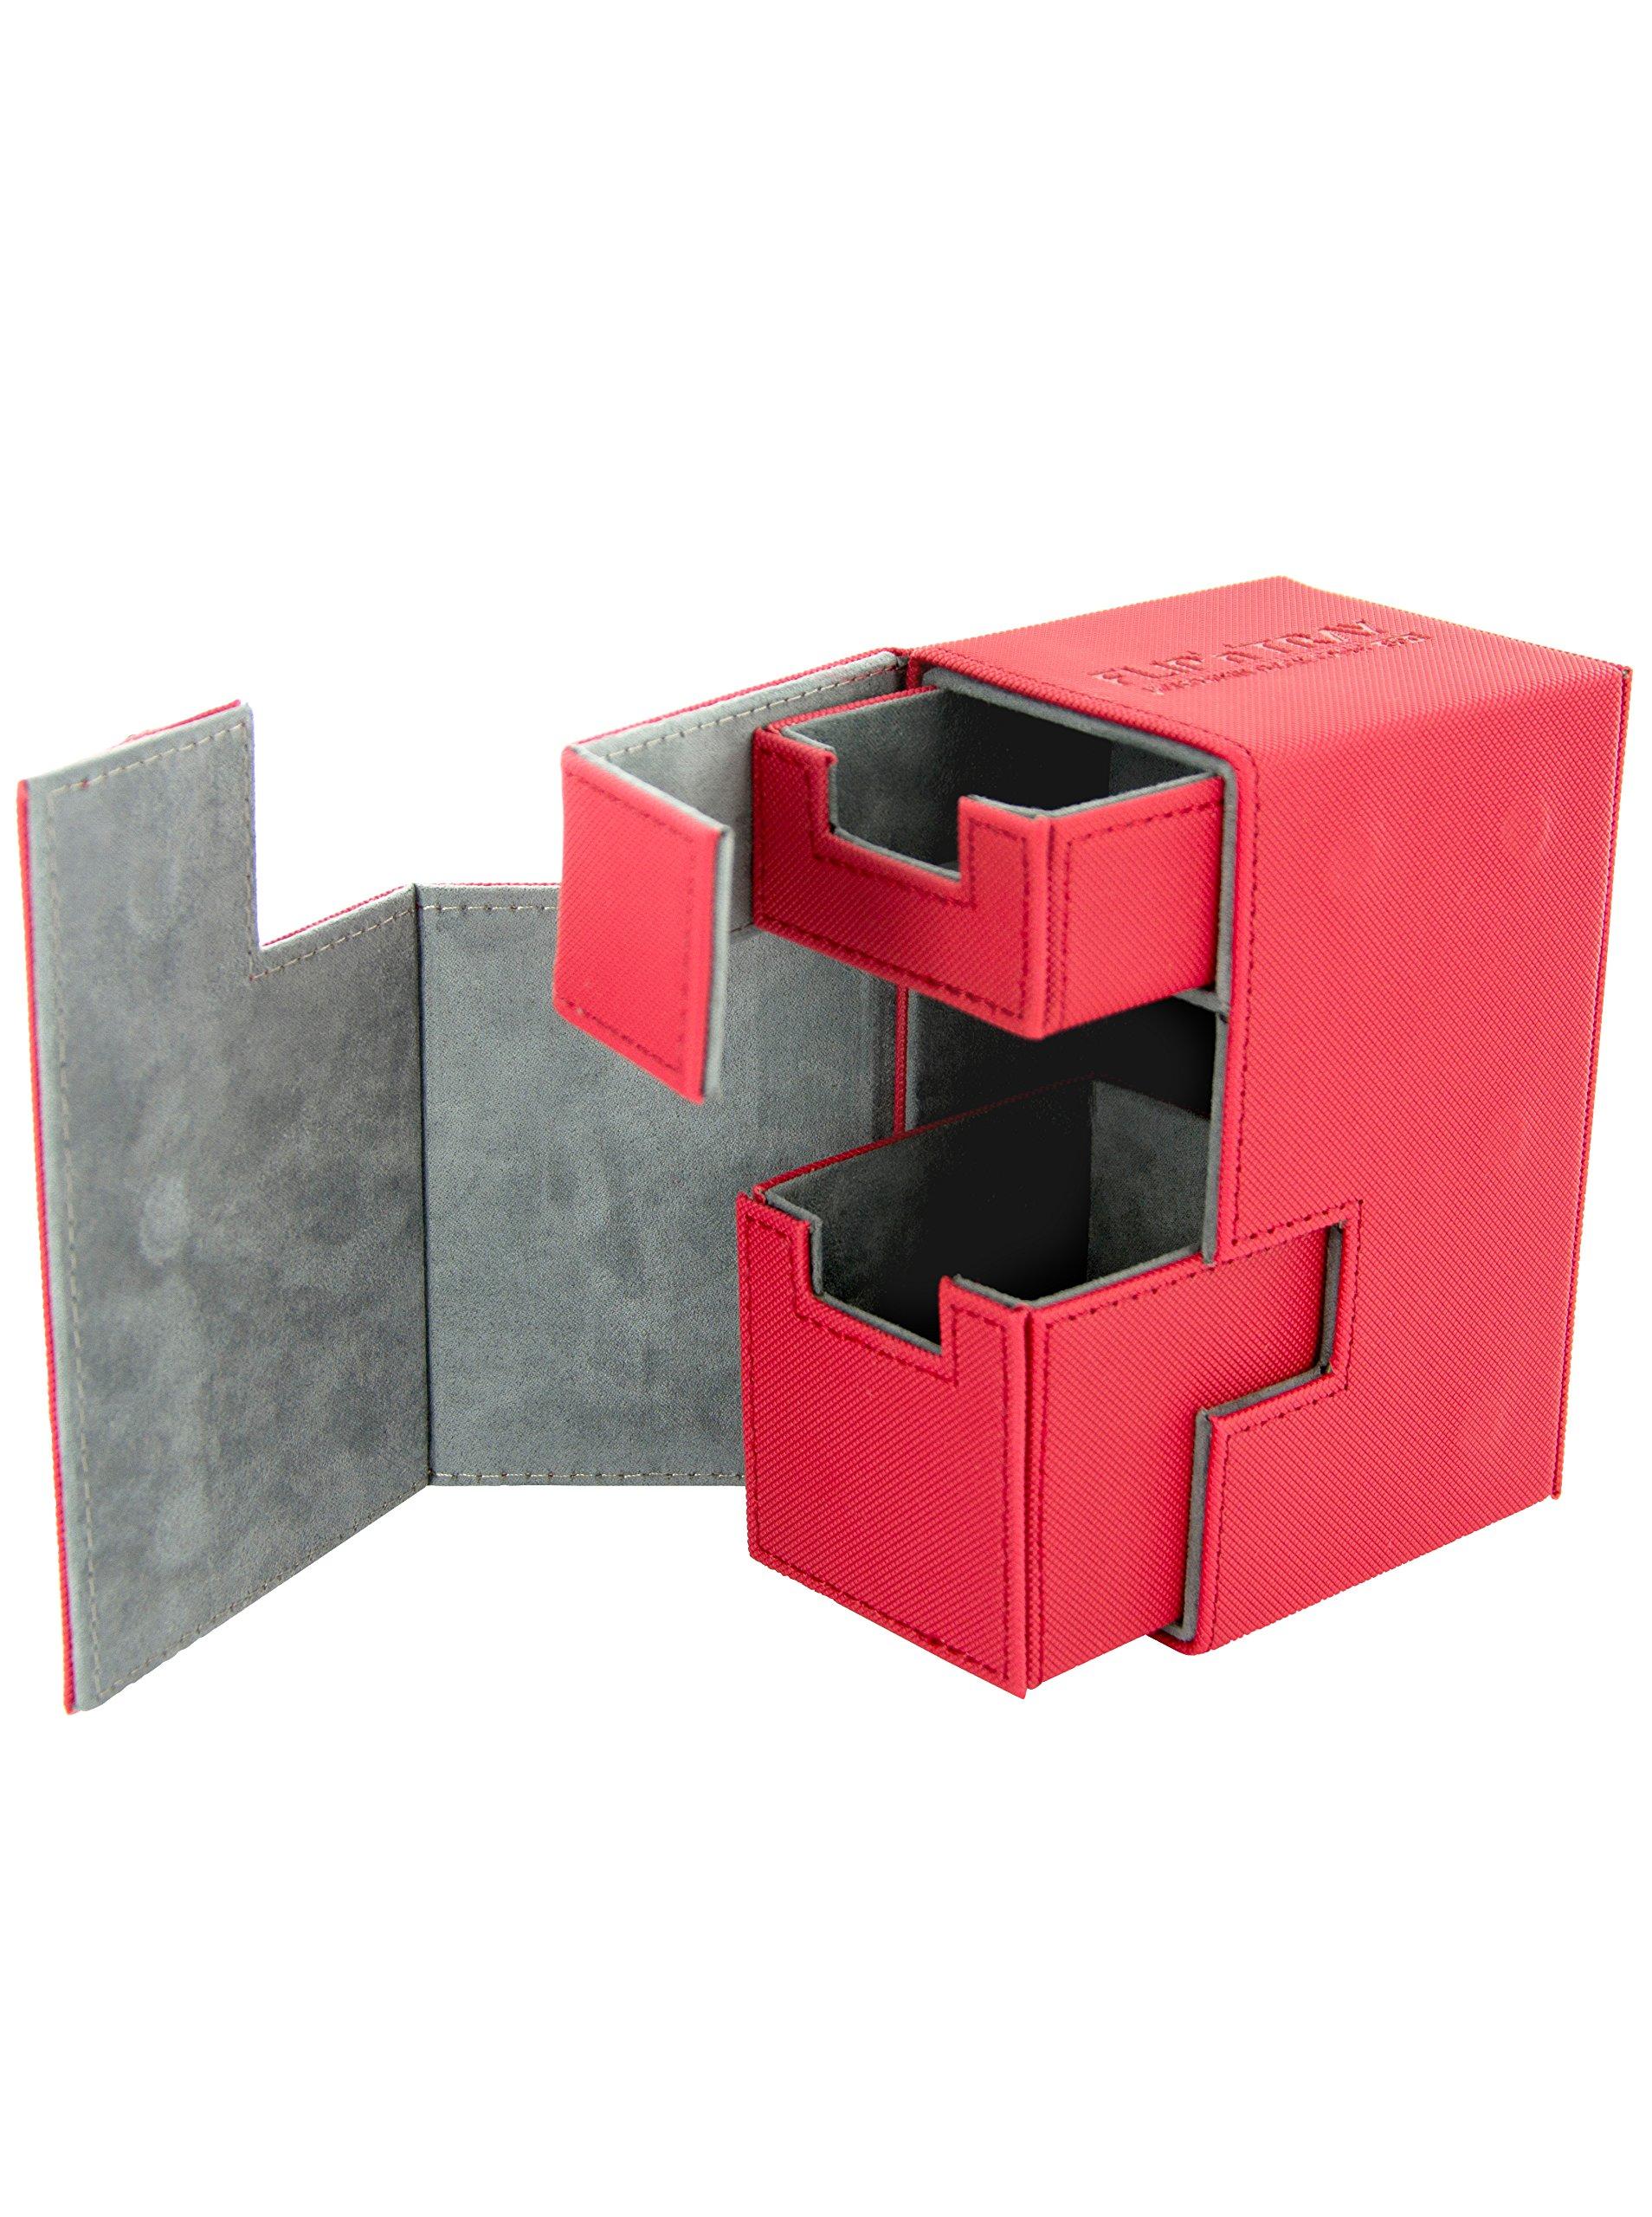 Flip 'n' Tray XenoSkin Deck Box, Red